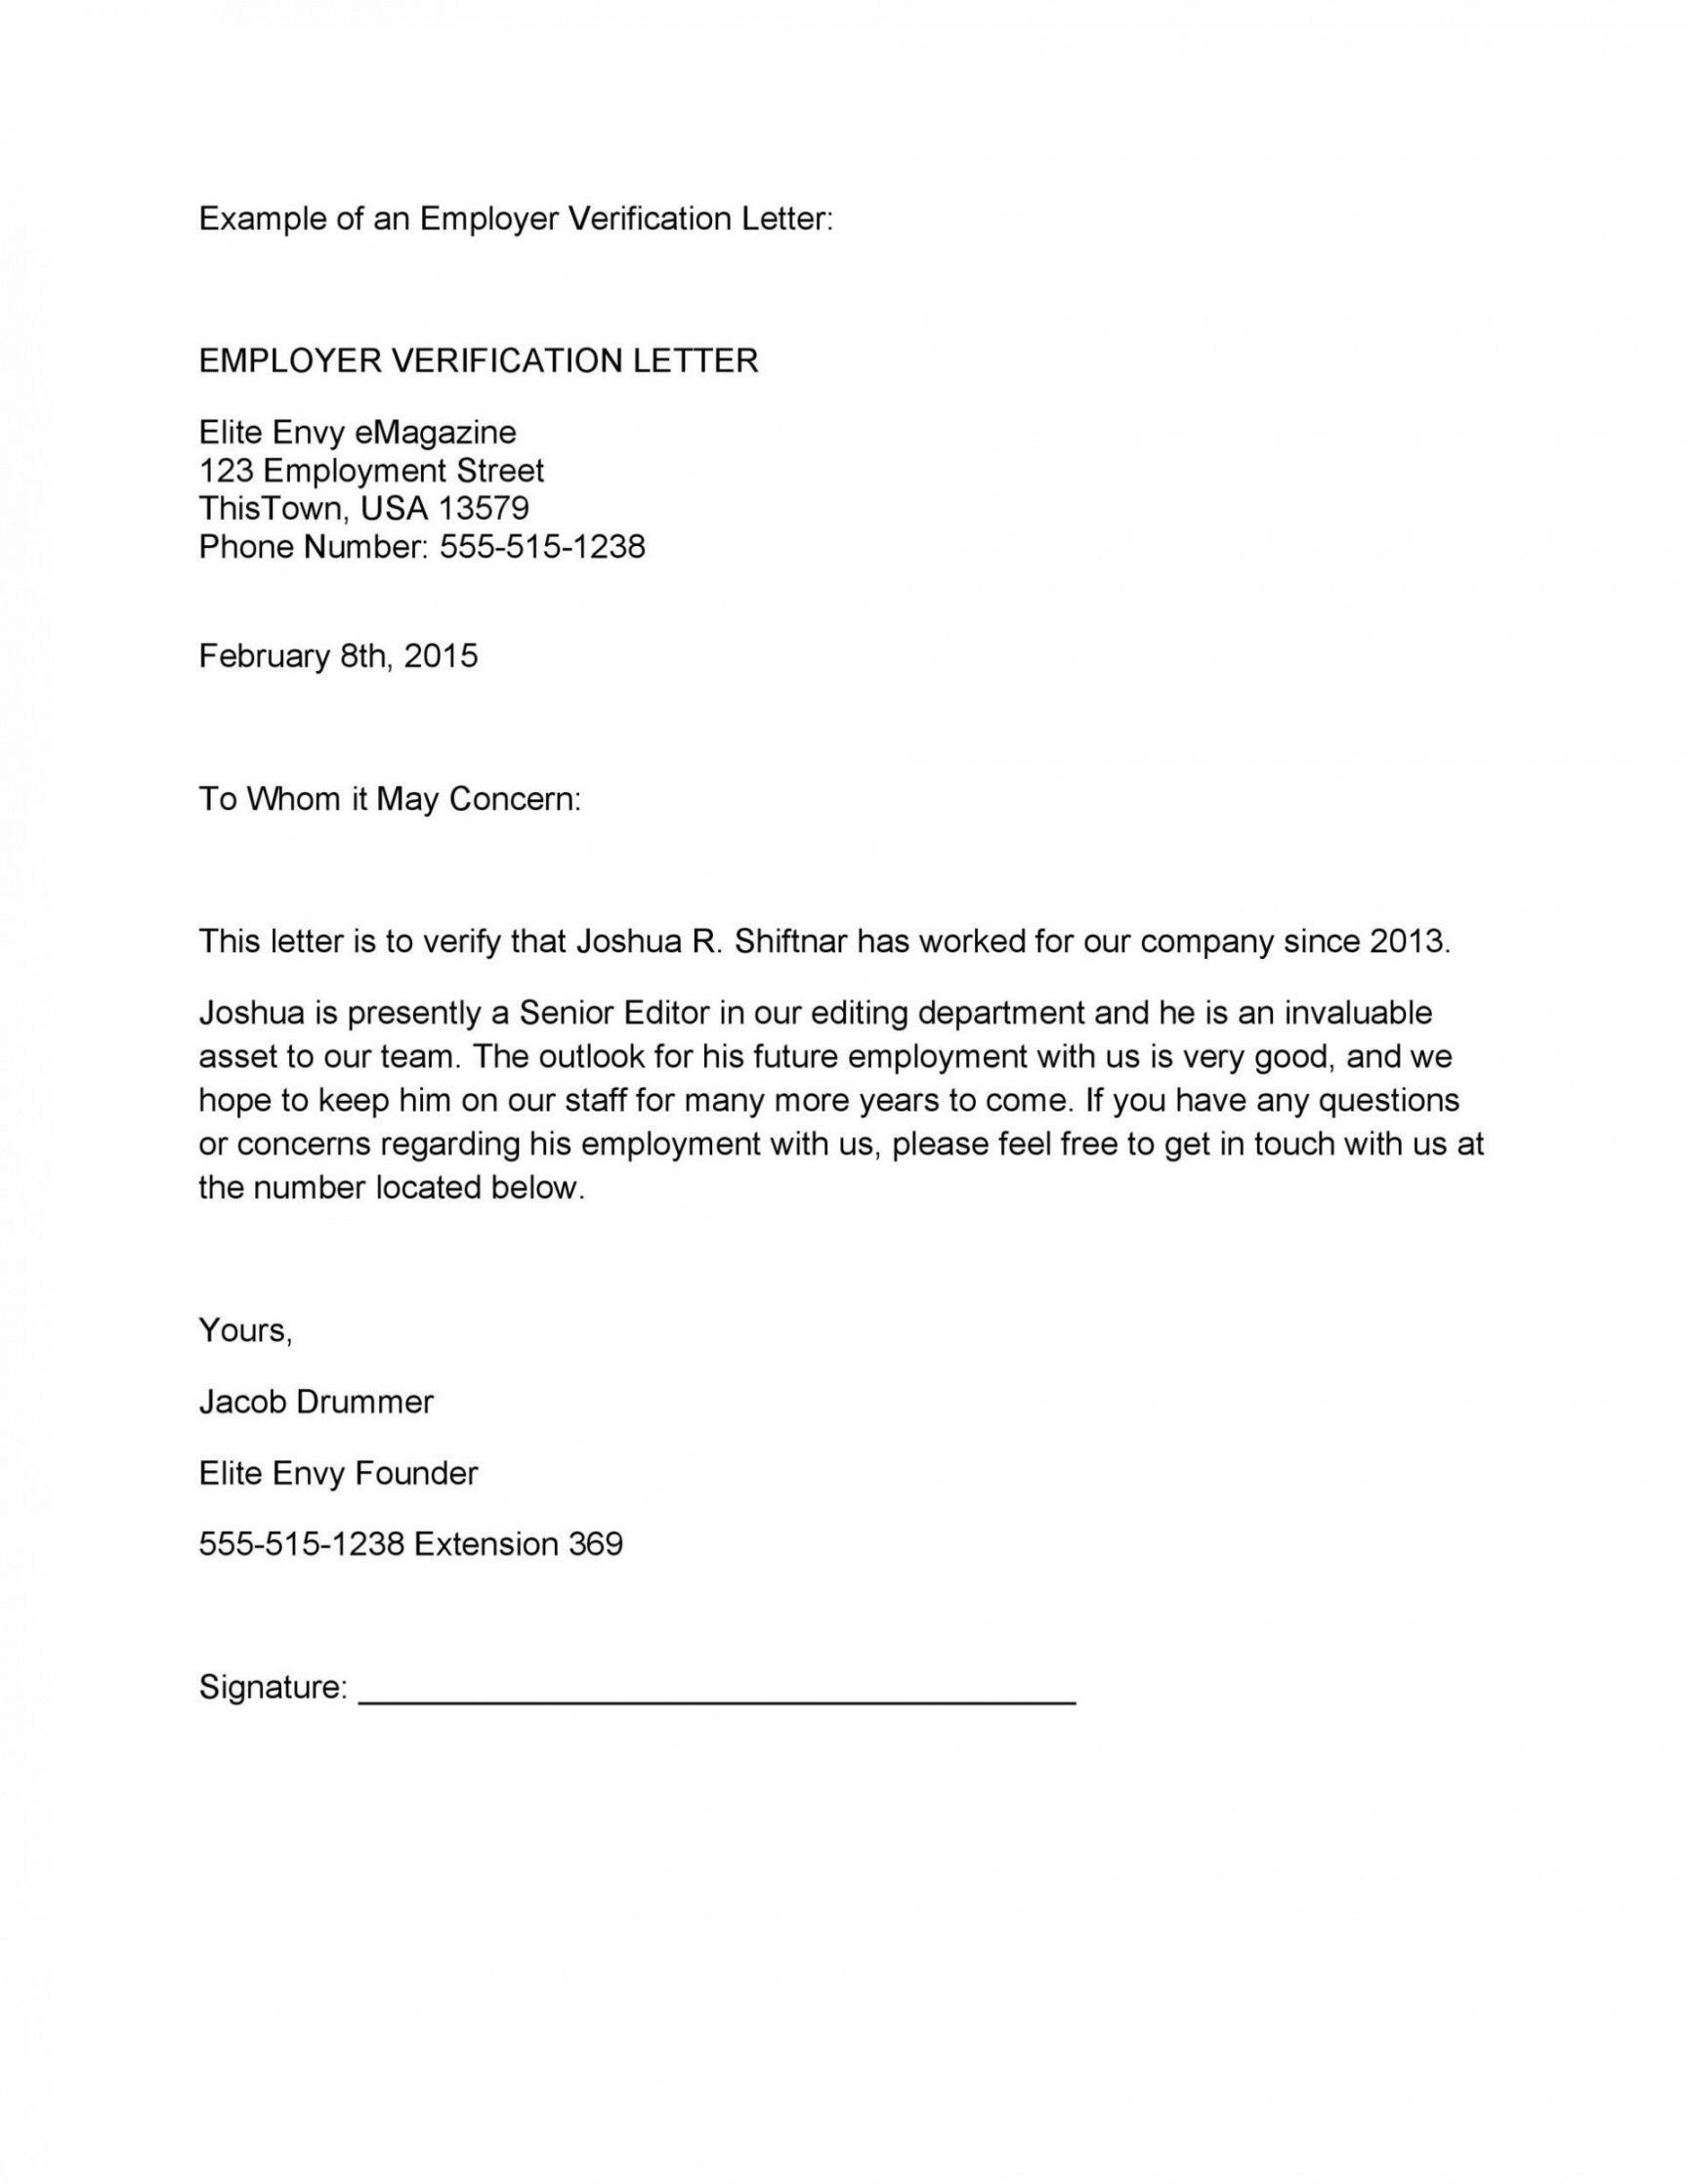 Professional Employment Verification Letter Template Example In 2021 Letter Of Employment Employment Letter Sample Lettering